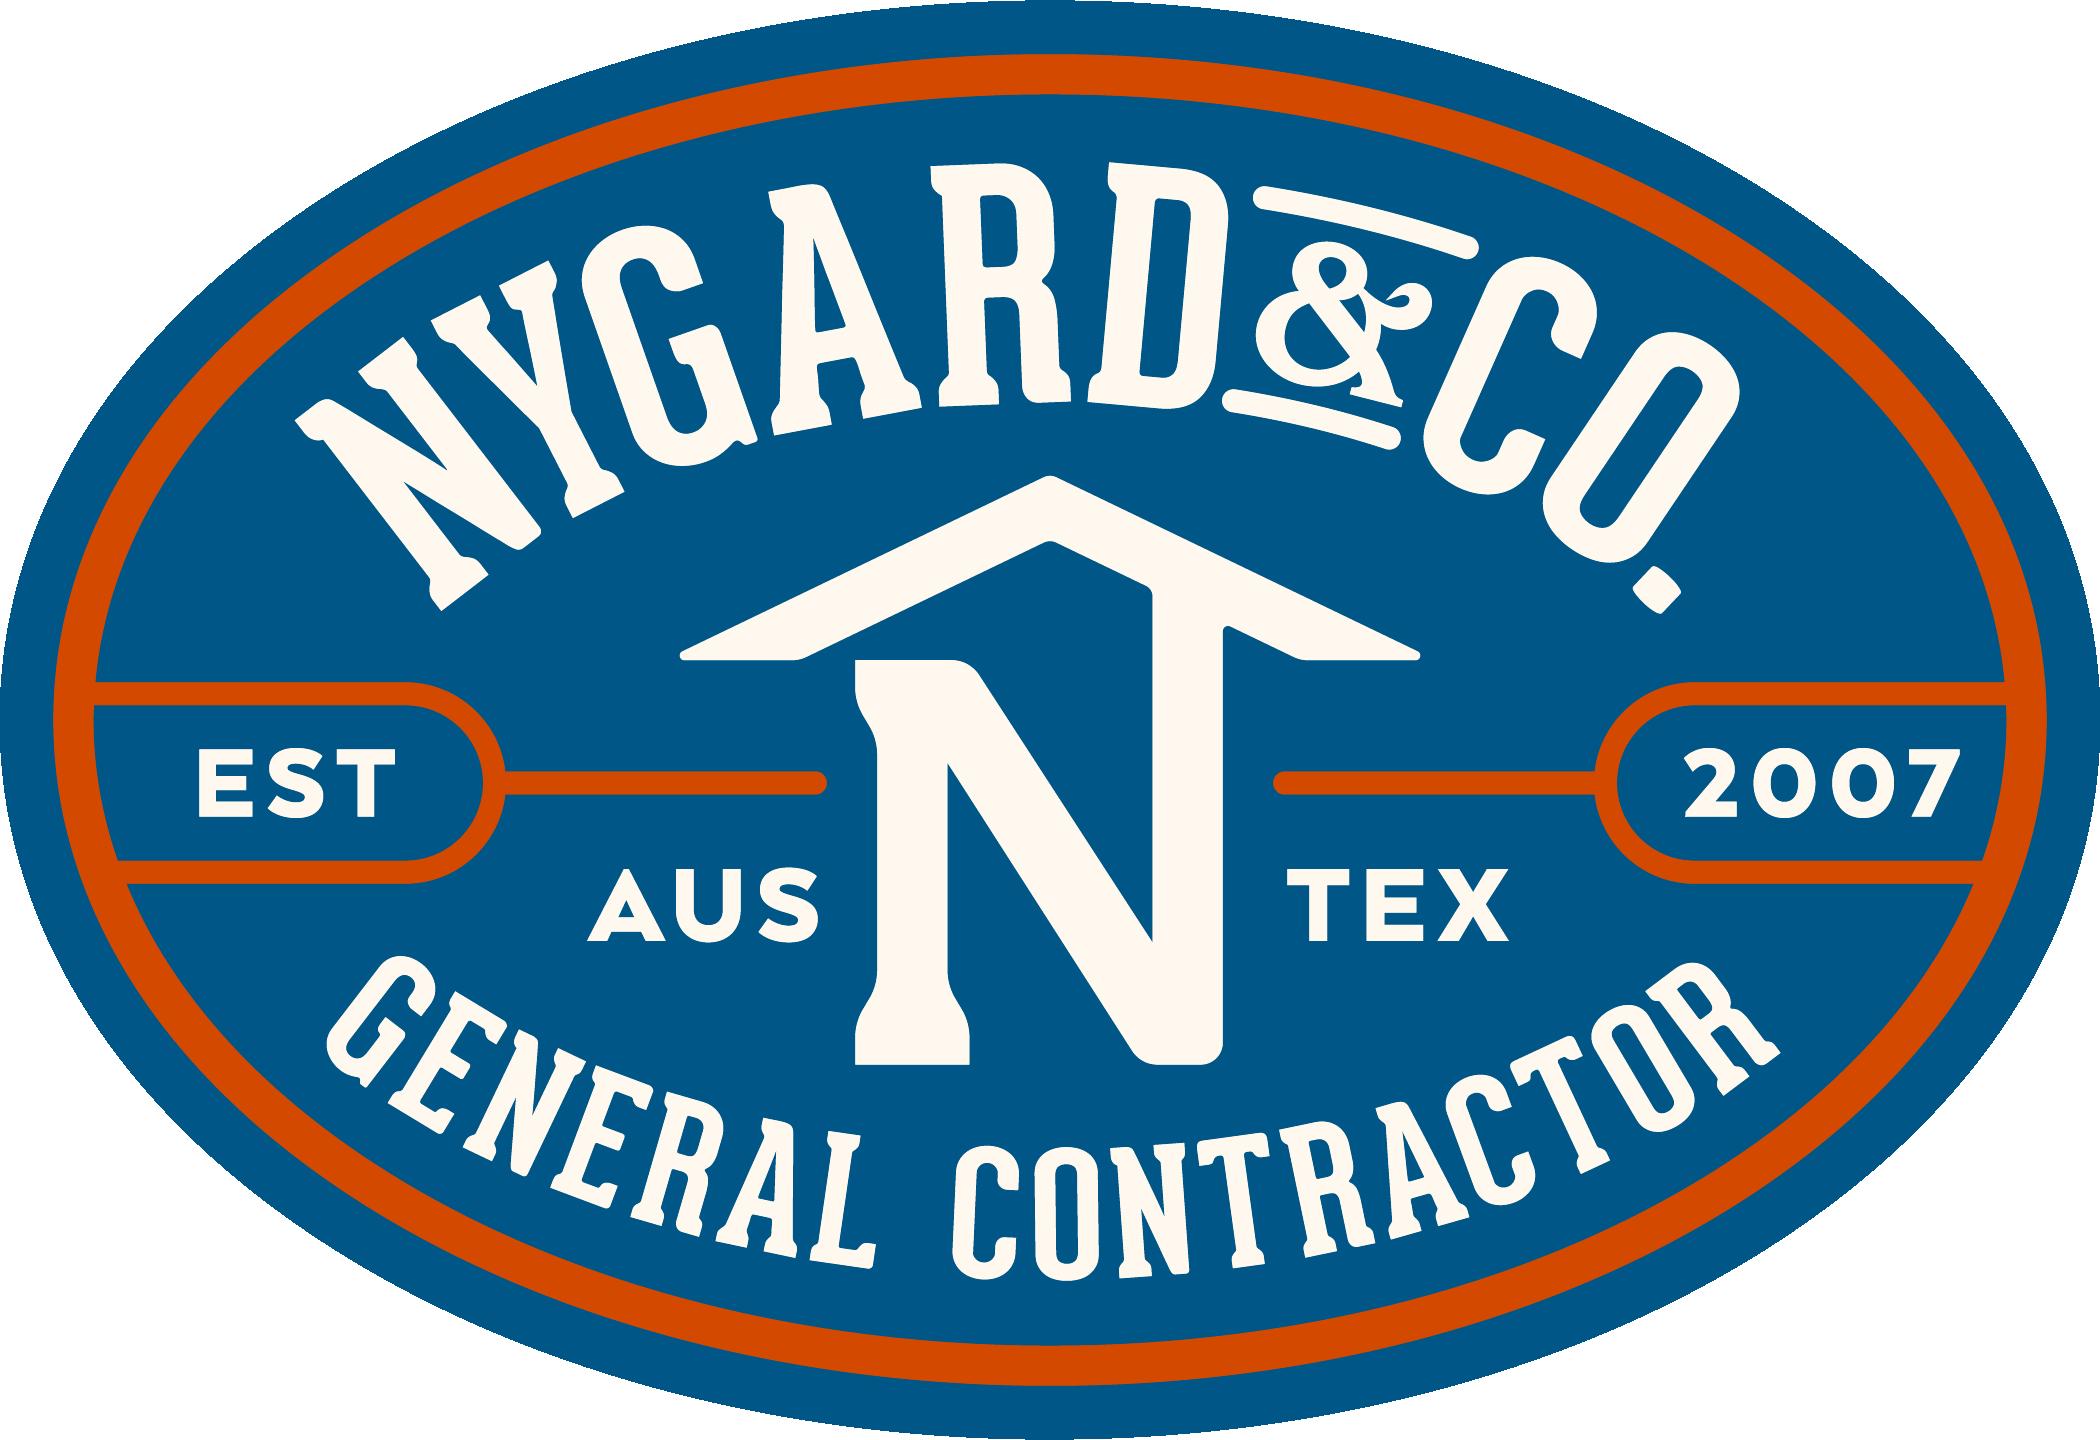 Nygard & Co.